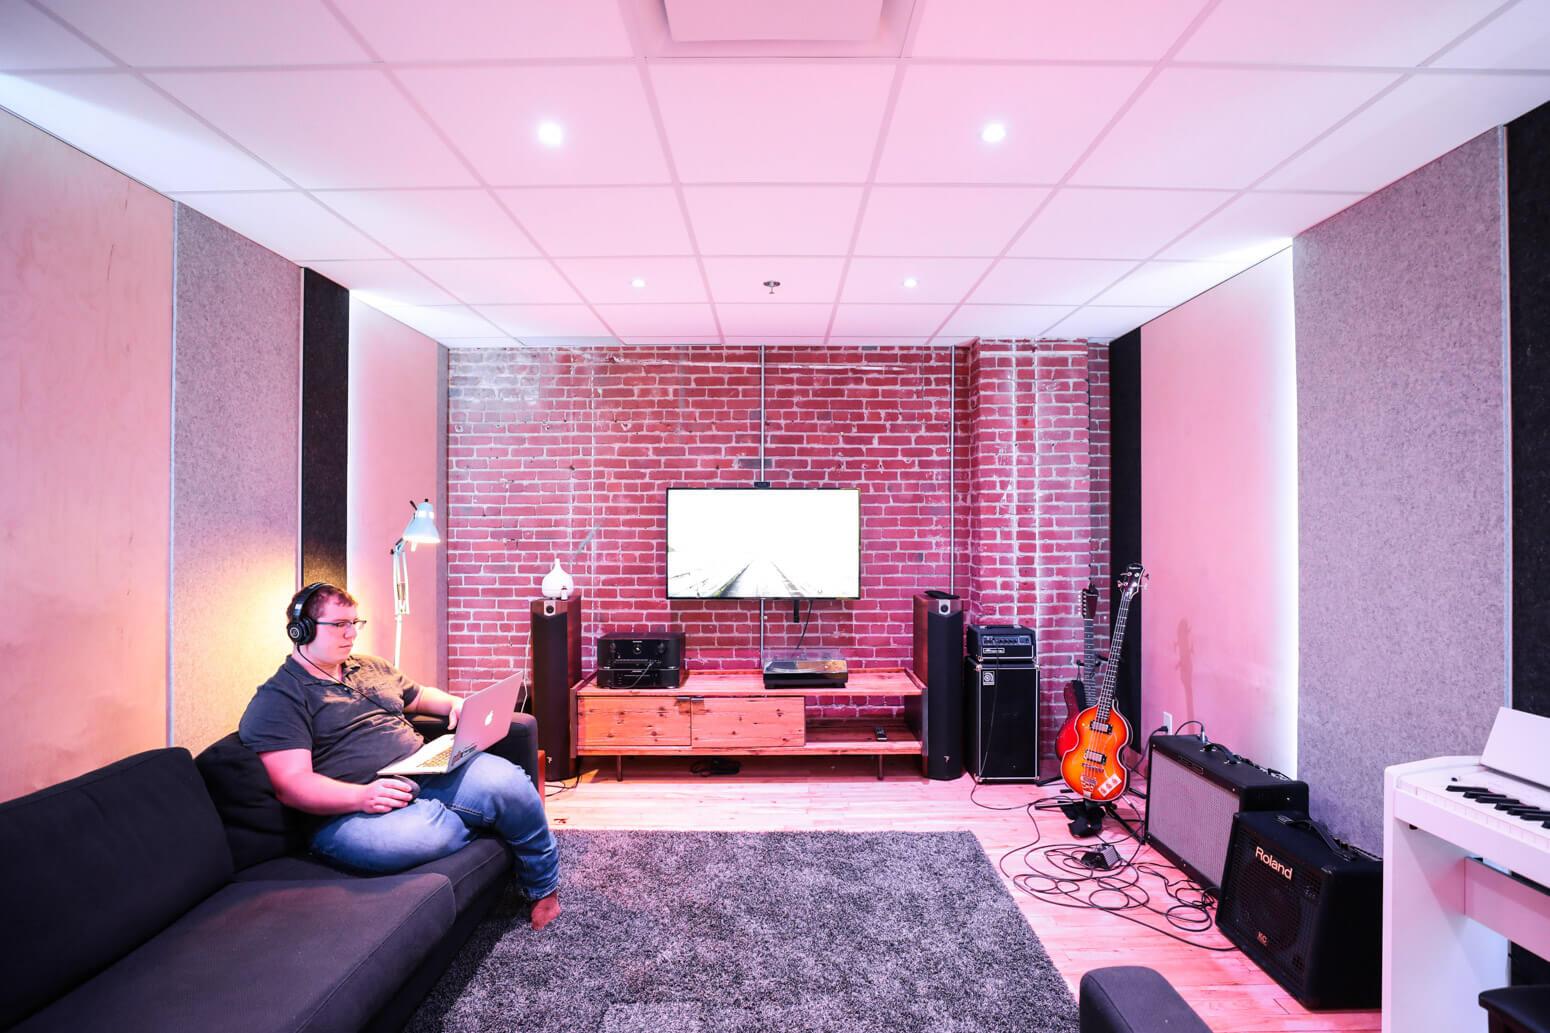 Shutterstock Montreal Office Killer Spaces-15